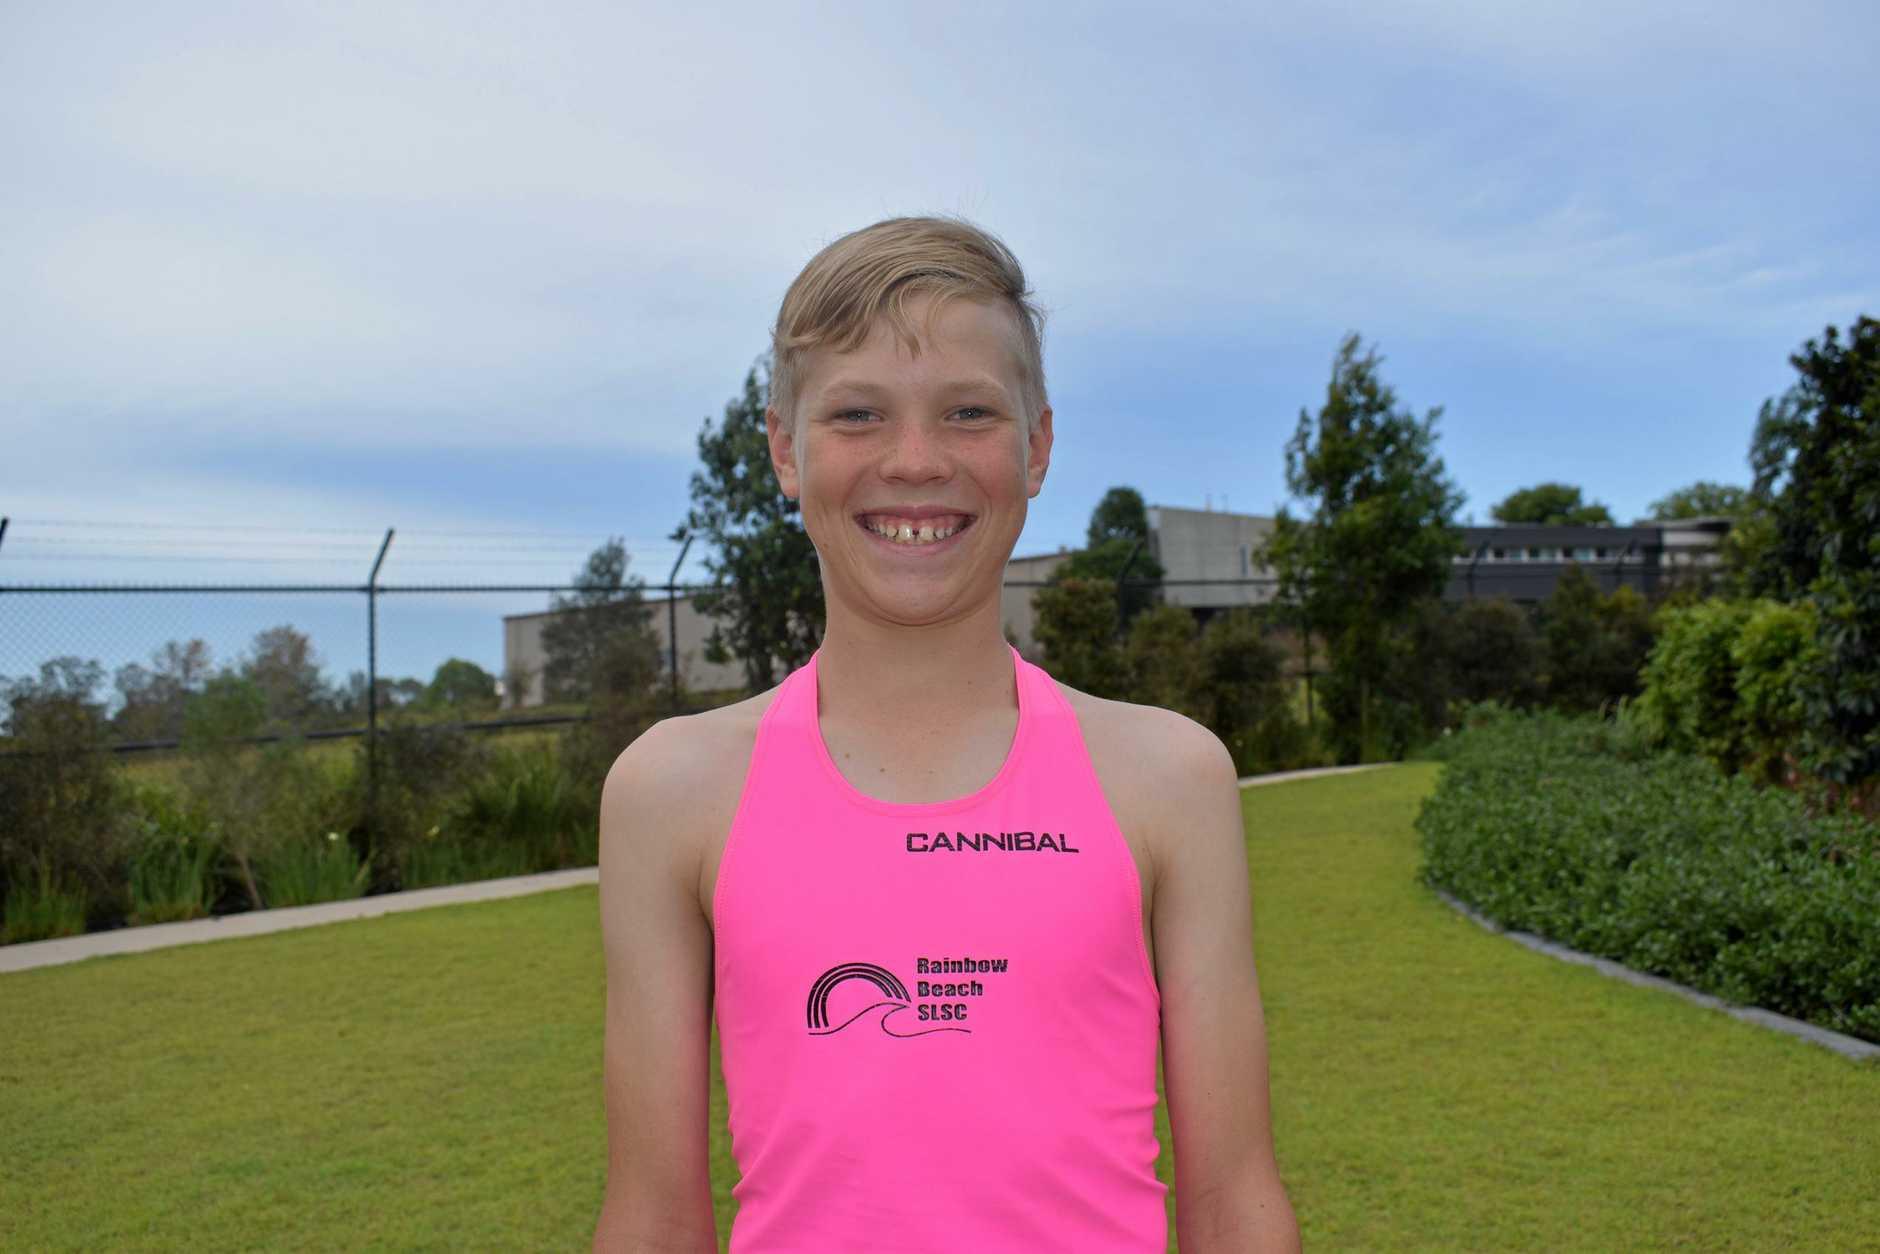 Nippers - Oliver Pratt, 11 training for the Rainbow Beach Surf Life Saving Club's Rainbow Beach Individual Carnival.